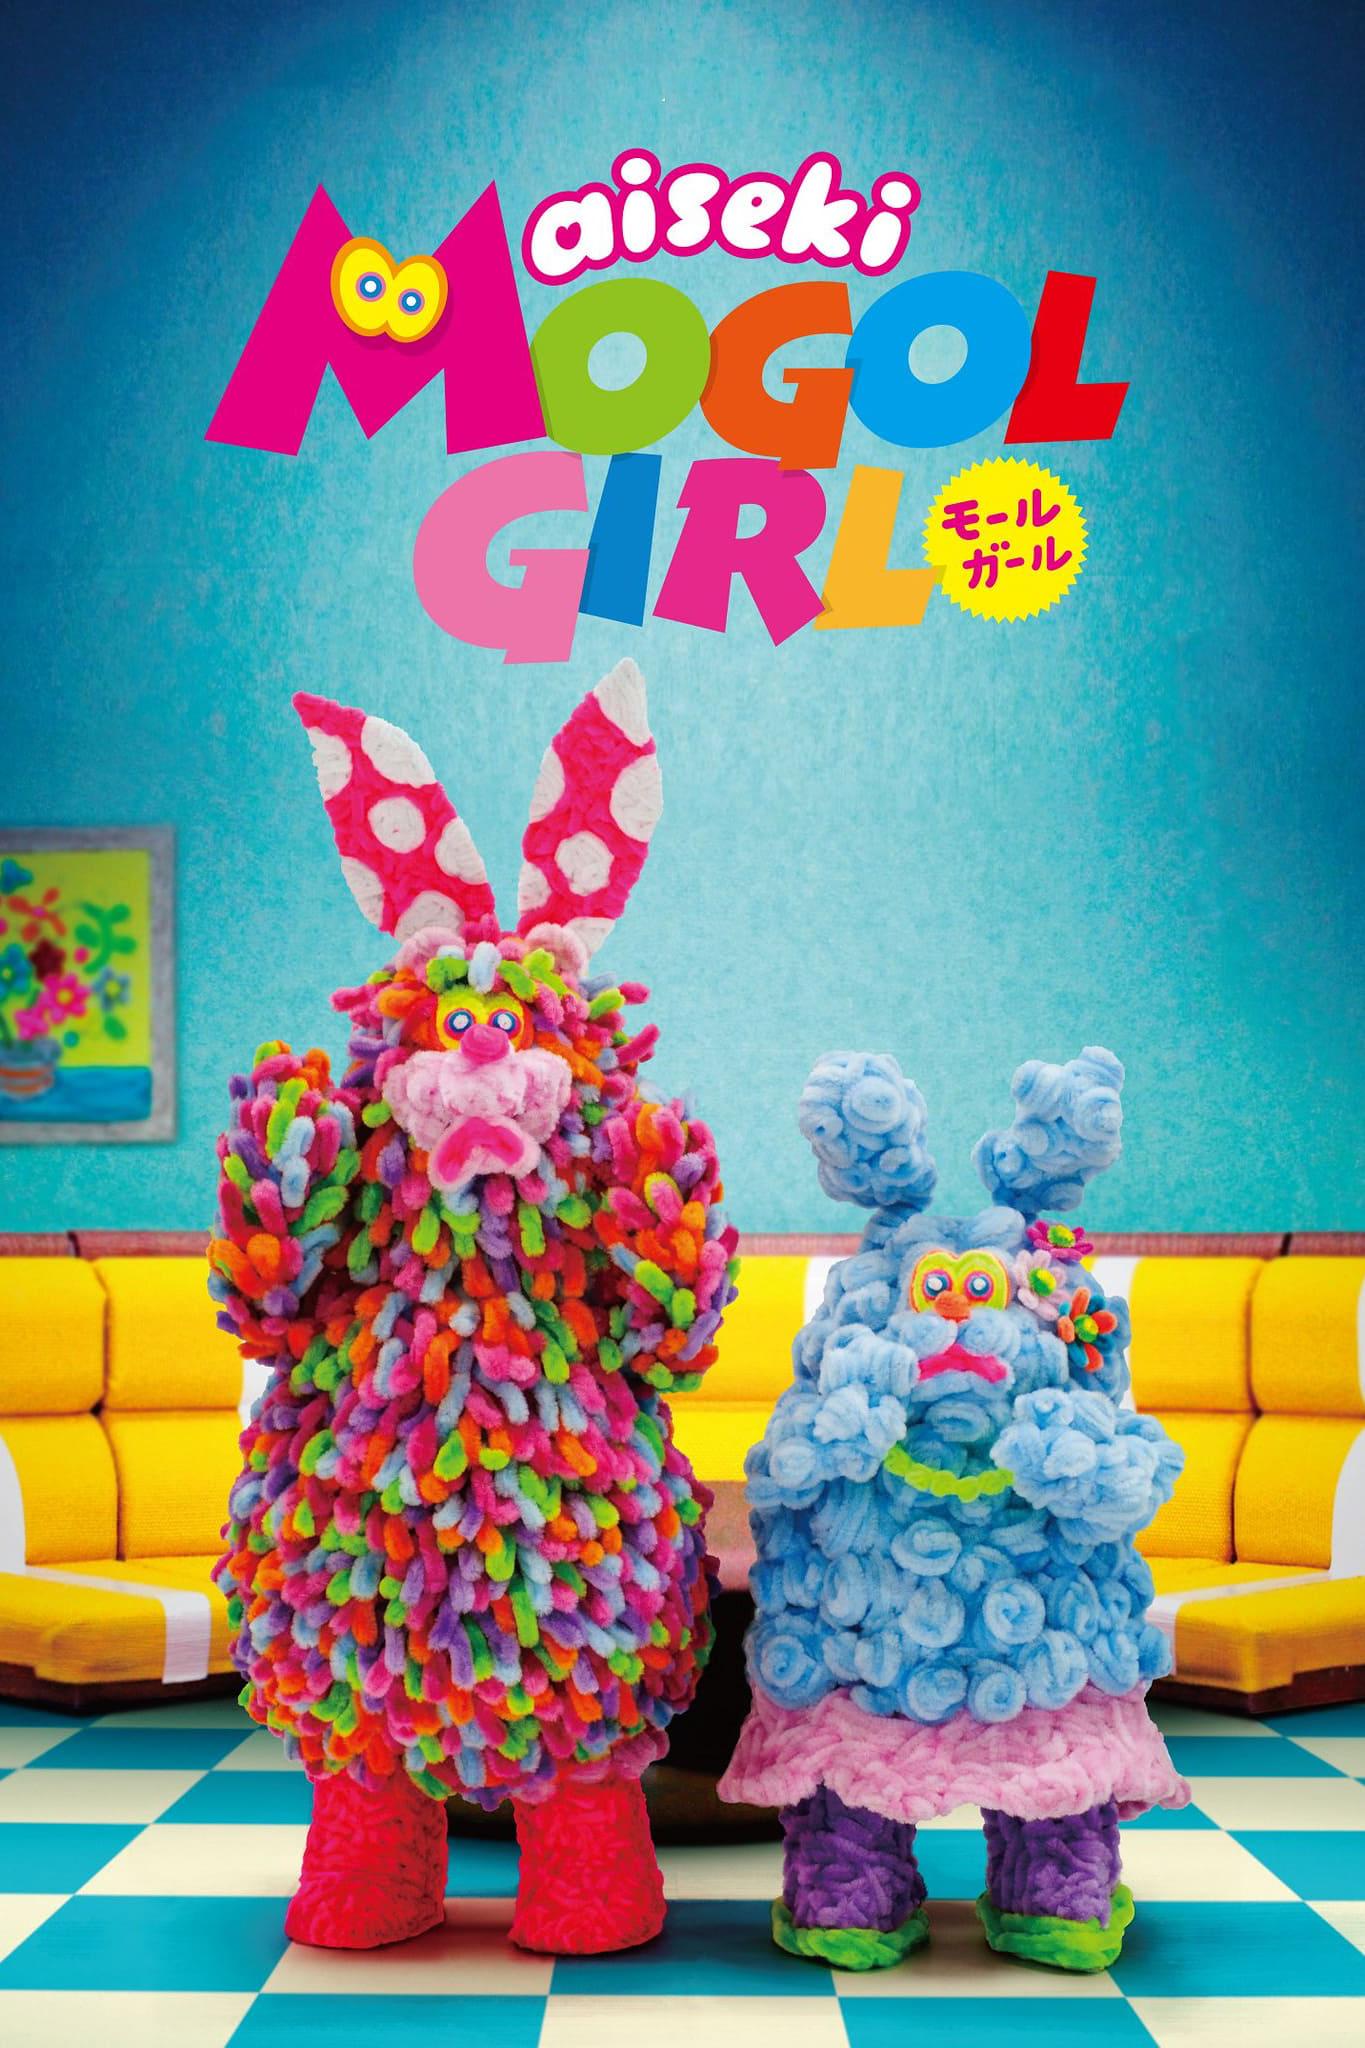 aiseki MOGOL GIRL TV Shows About Short Film